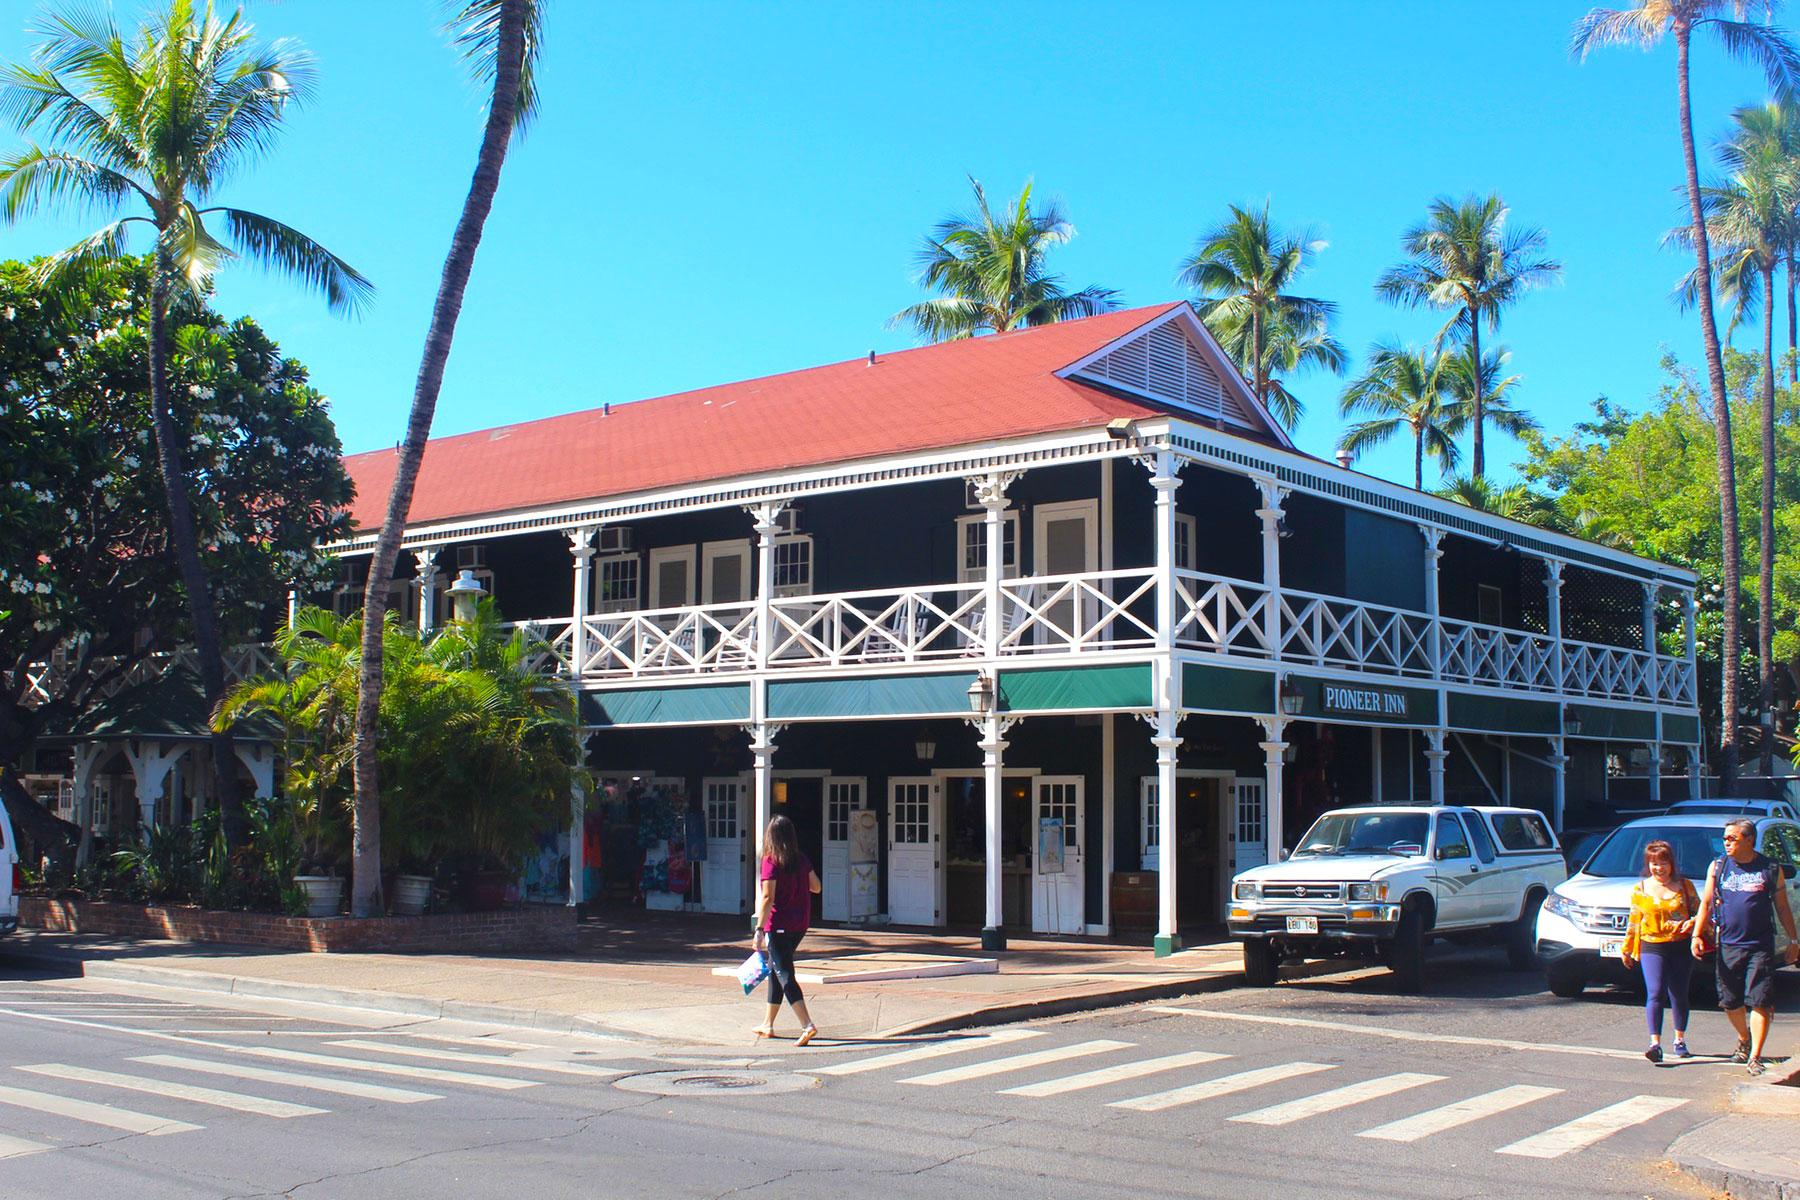 Streets of Lahaina, Maui - PearlMargaret.com